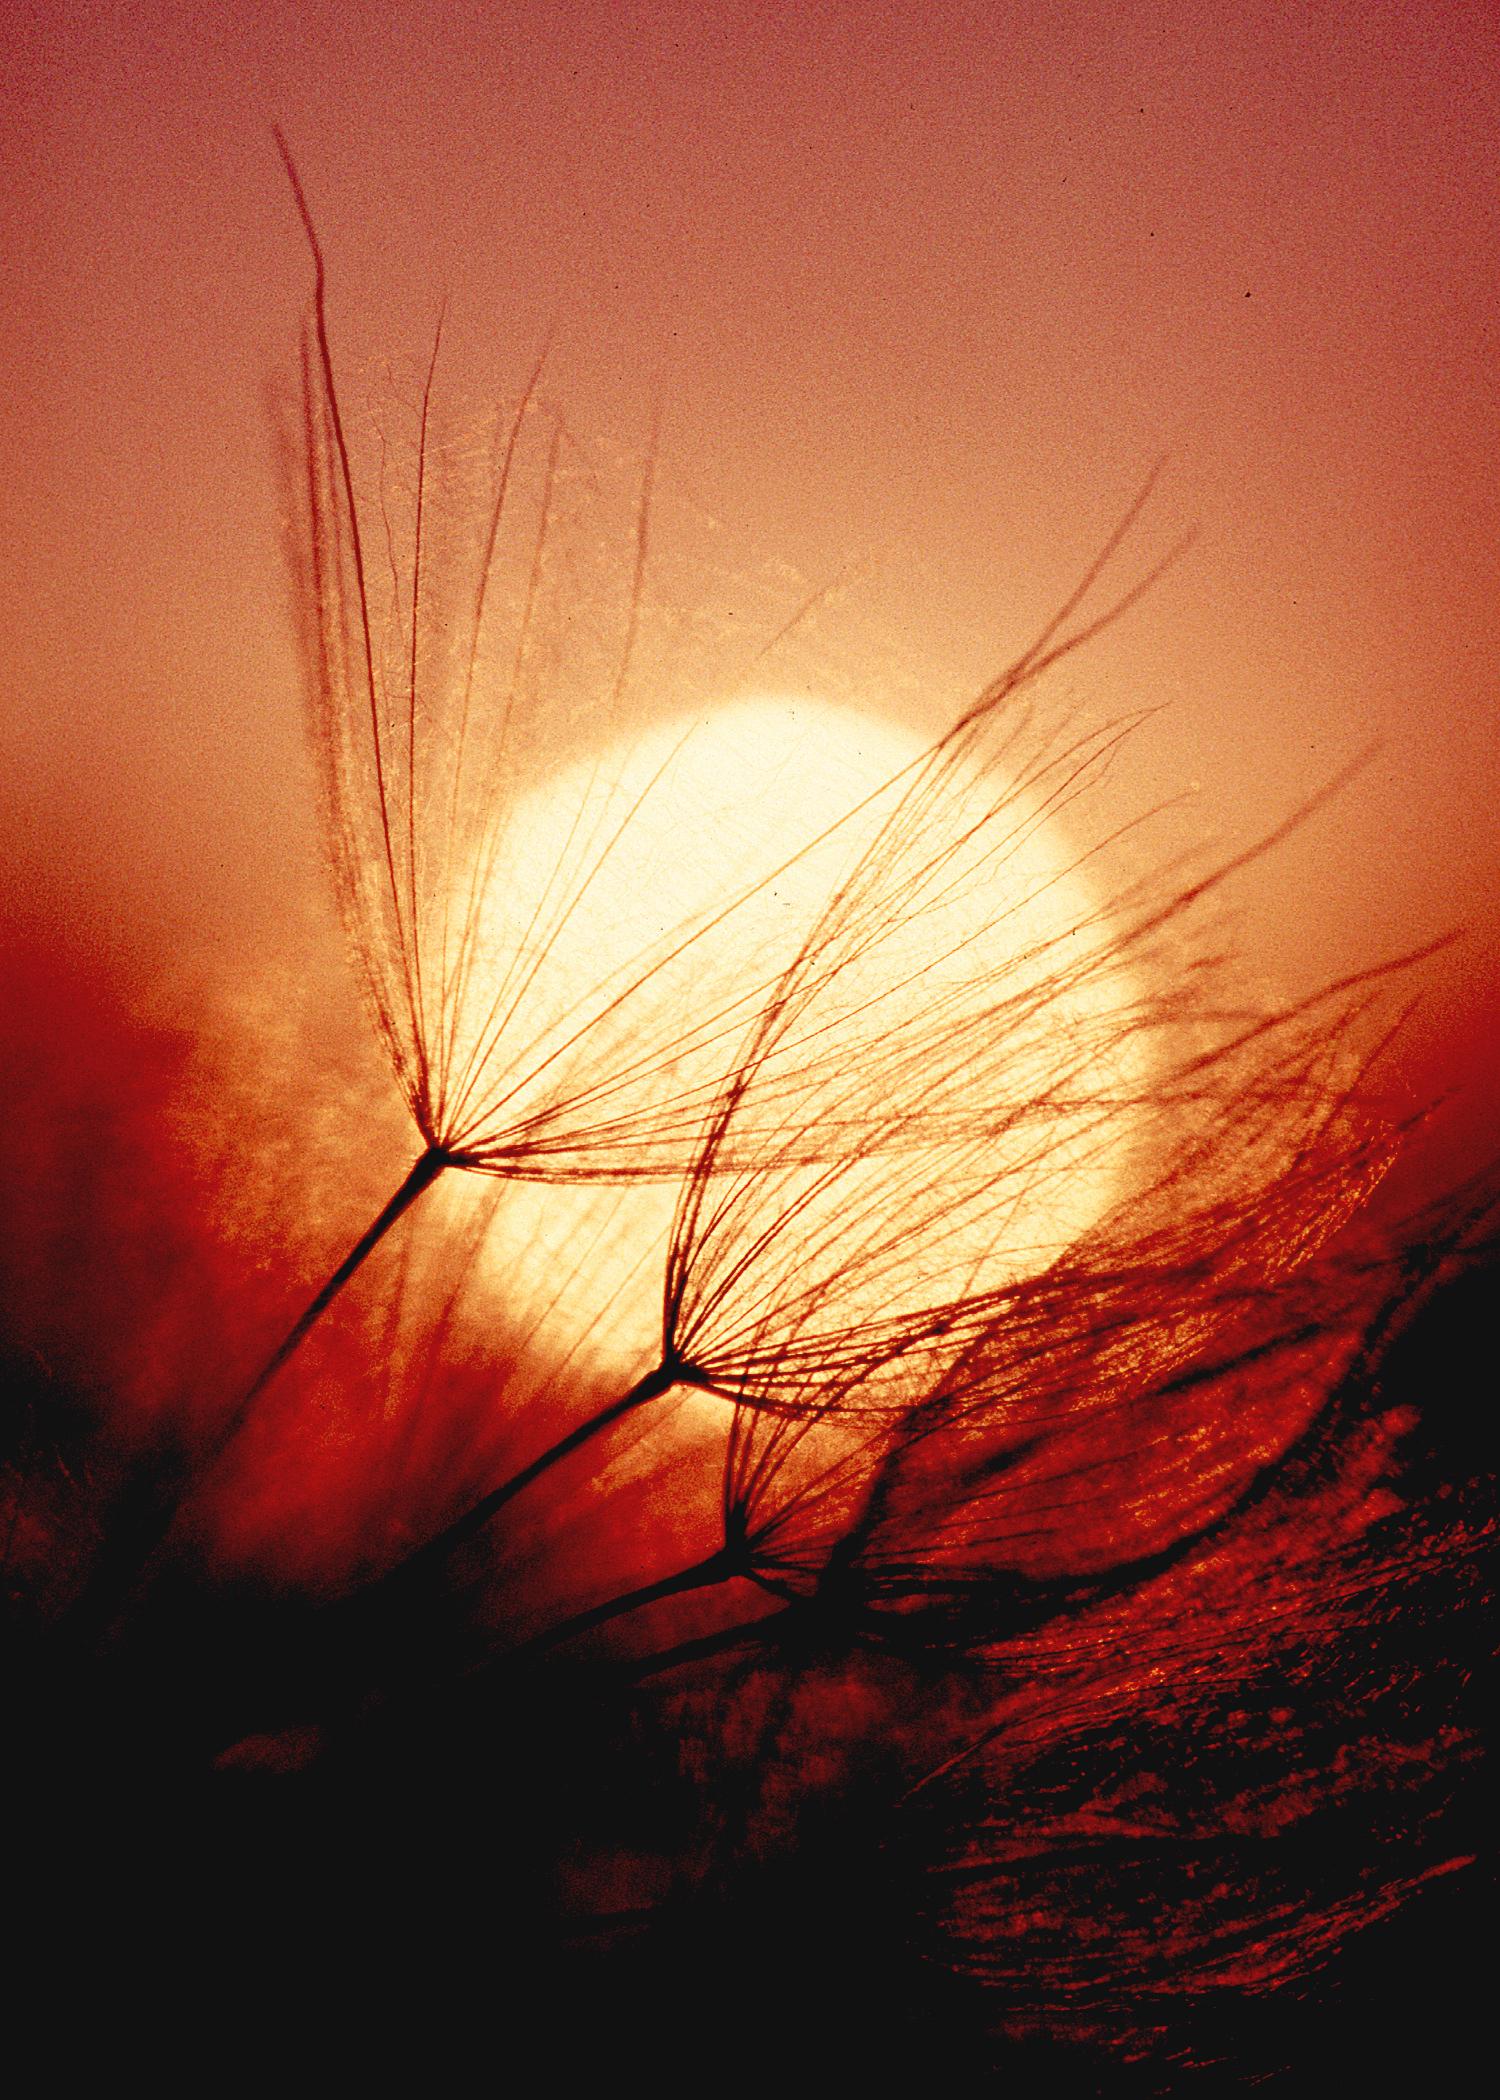 Milkweed at Sunset